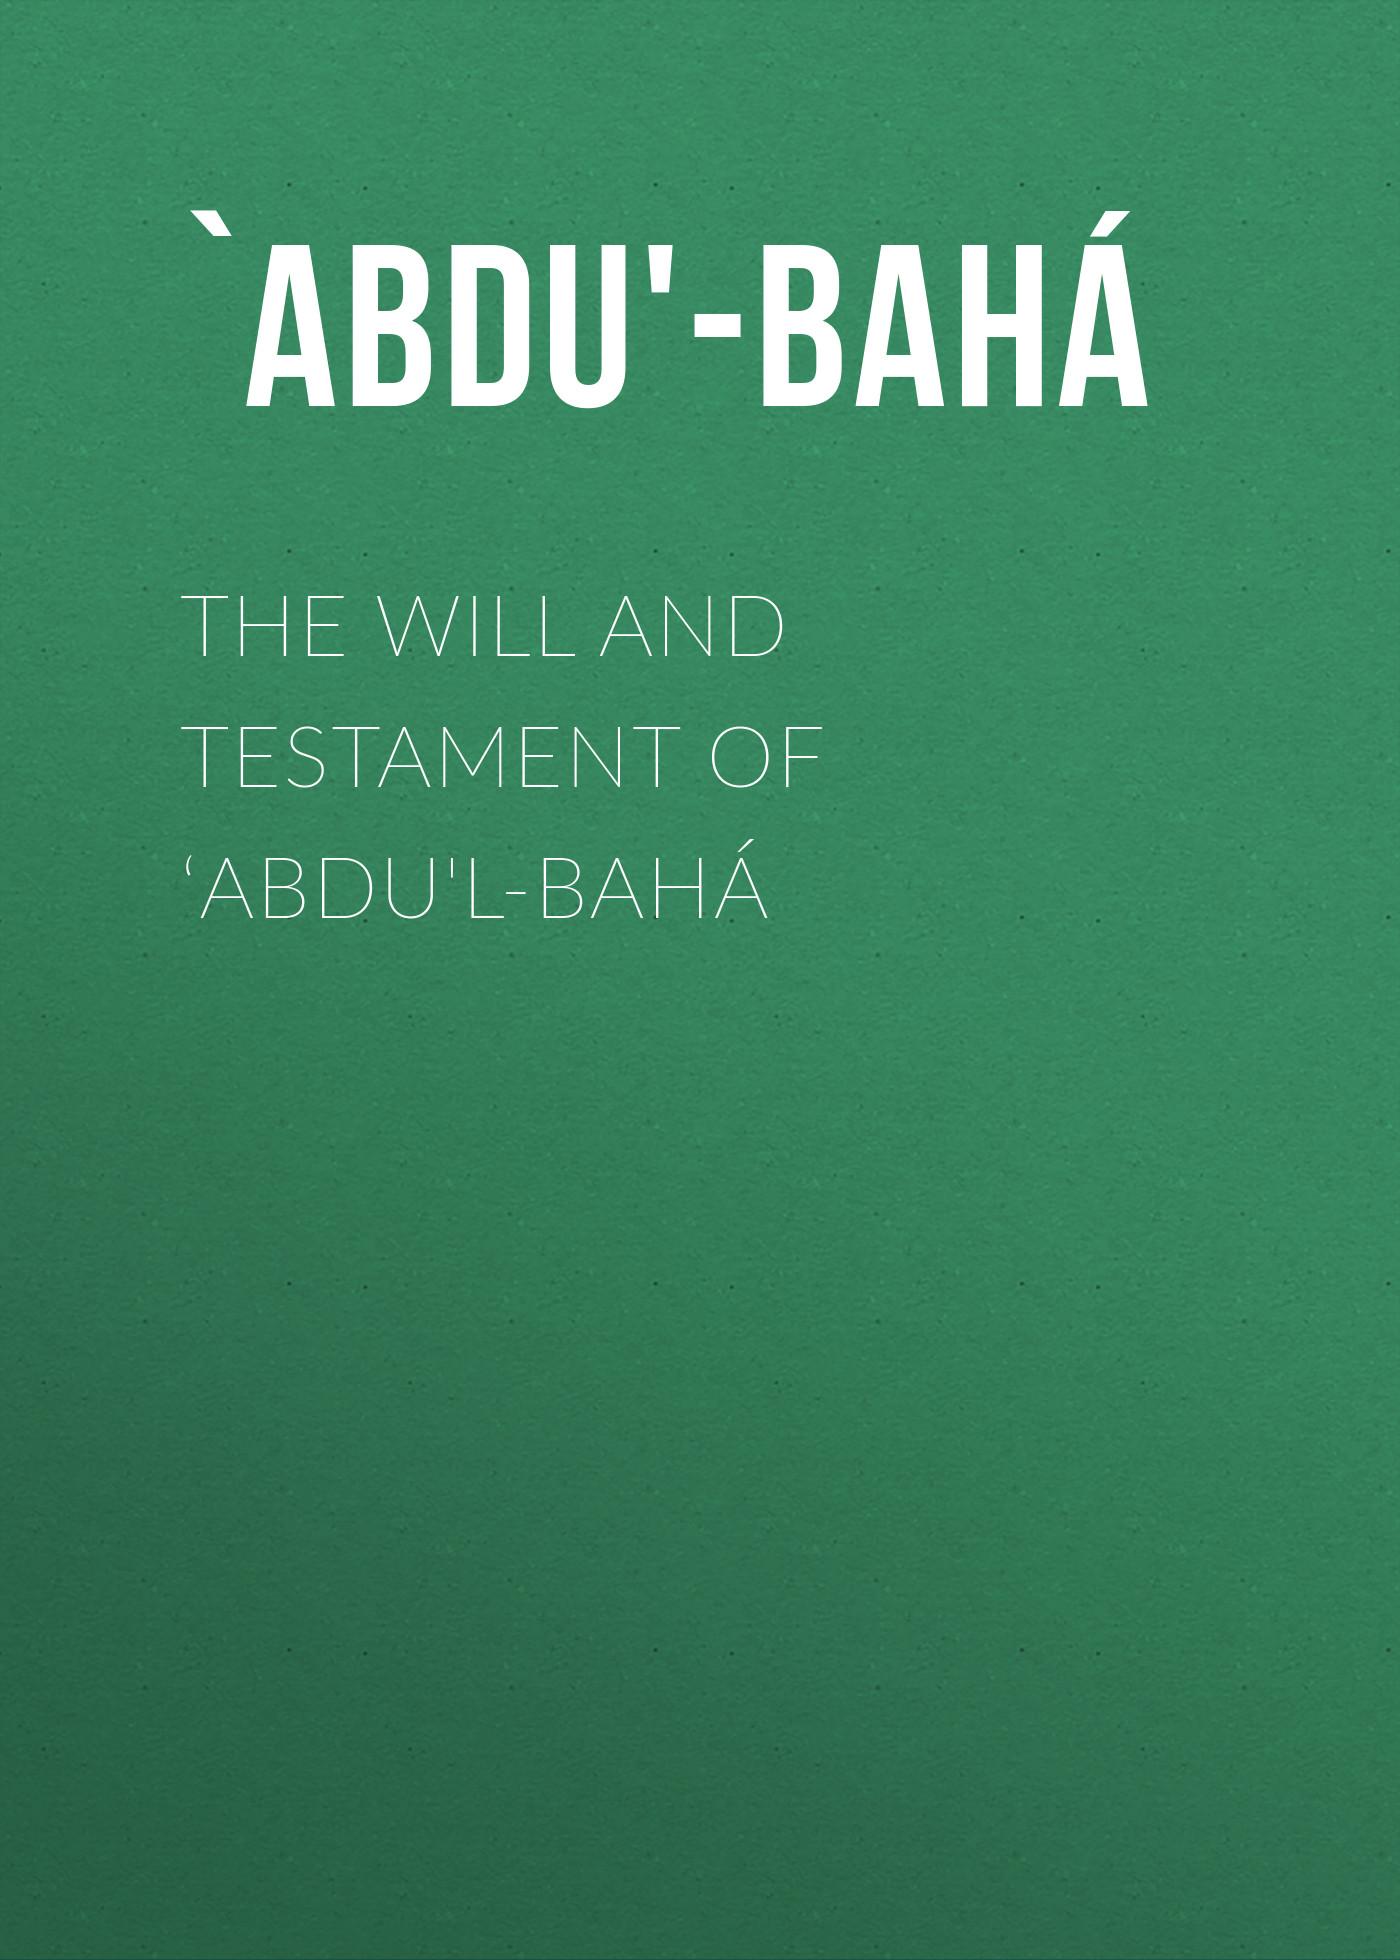 лучшая цена `Abdu'-Bahá The Will And Testament of 'Abdu'l-Bahá